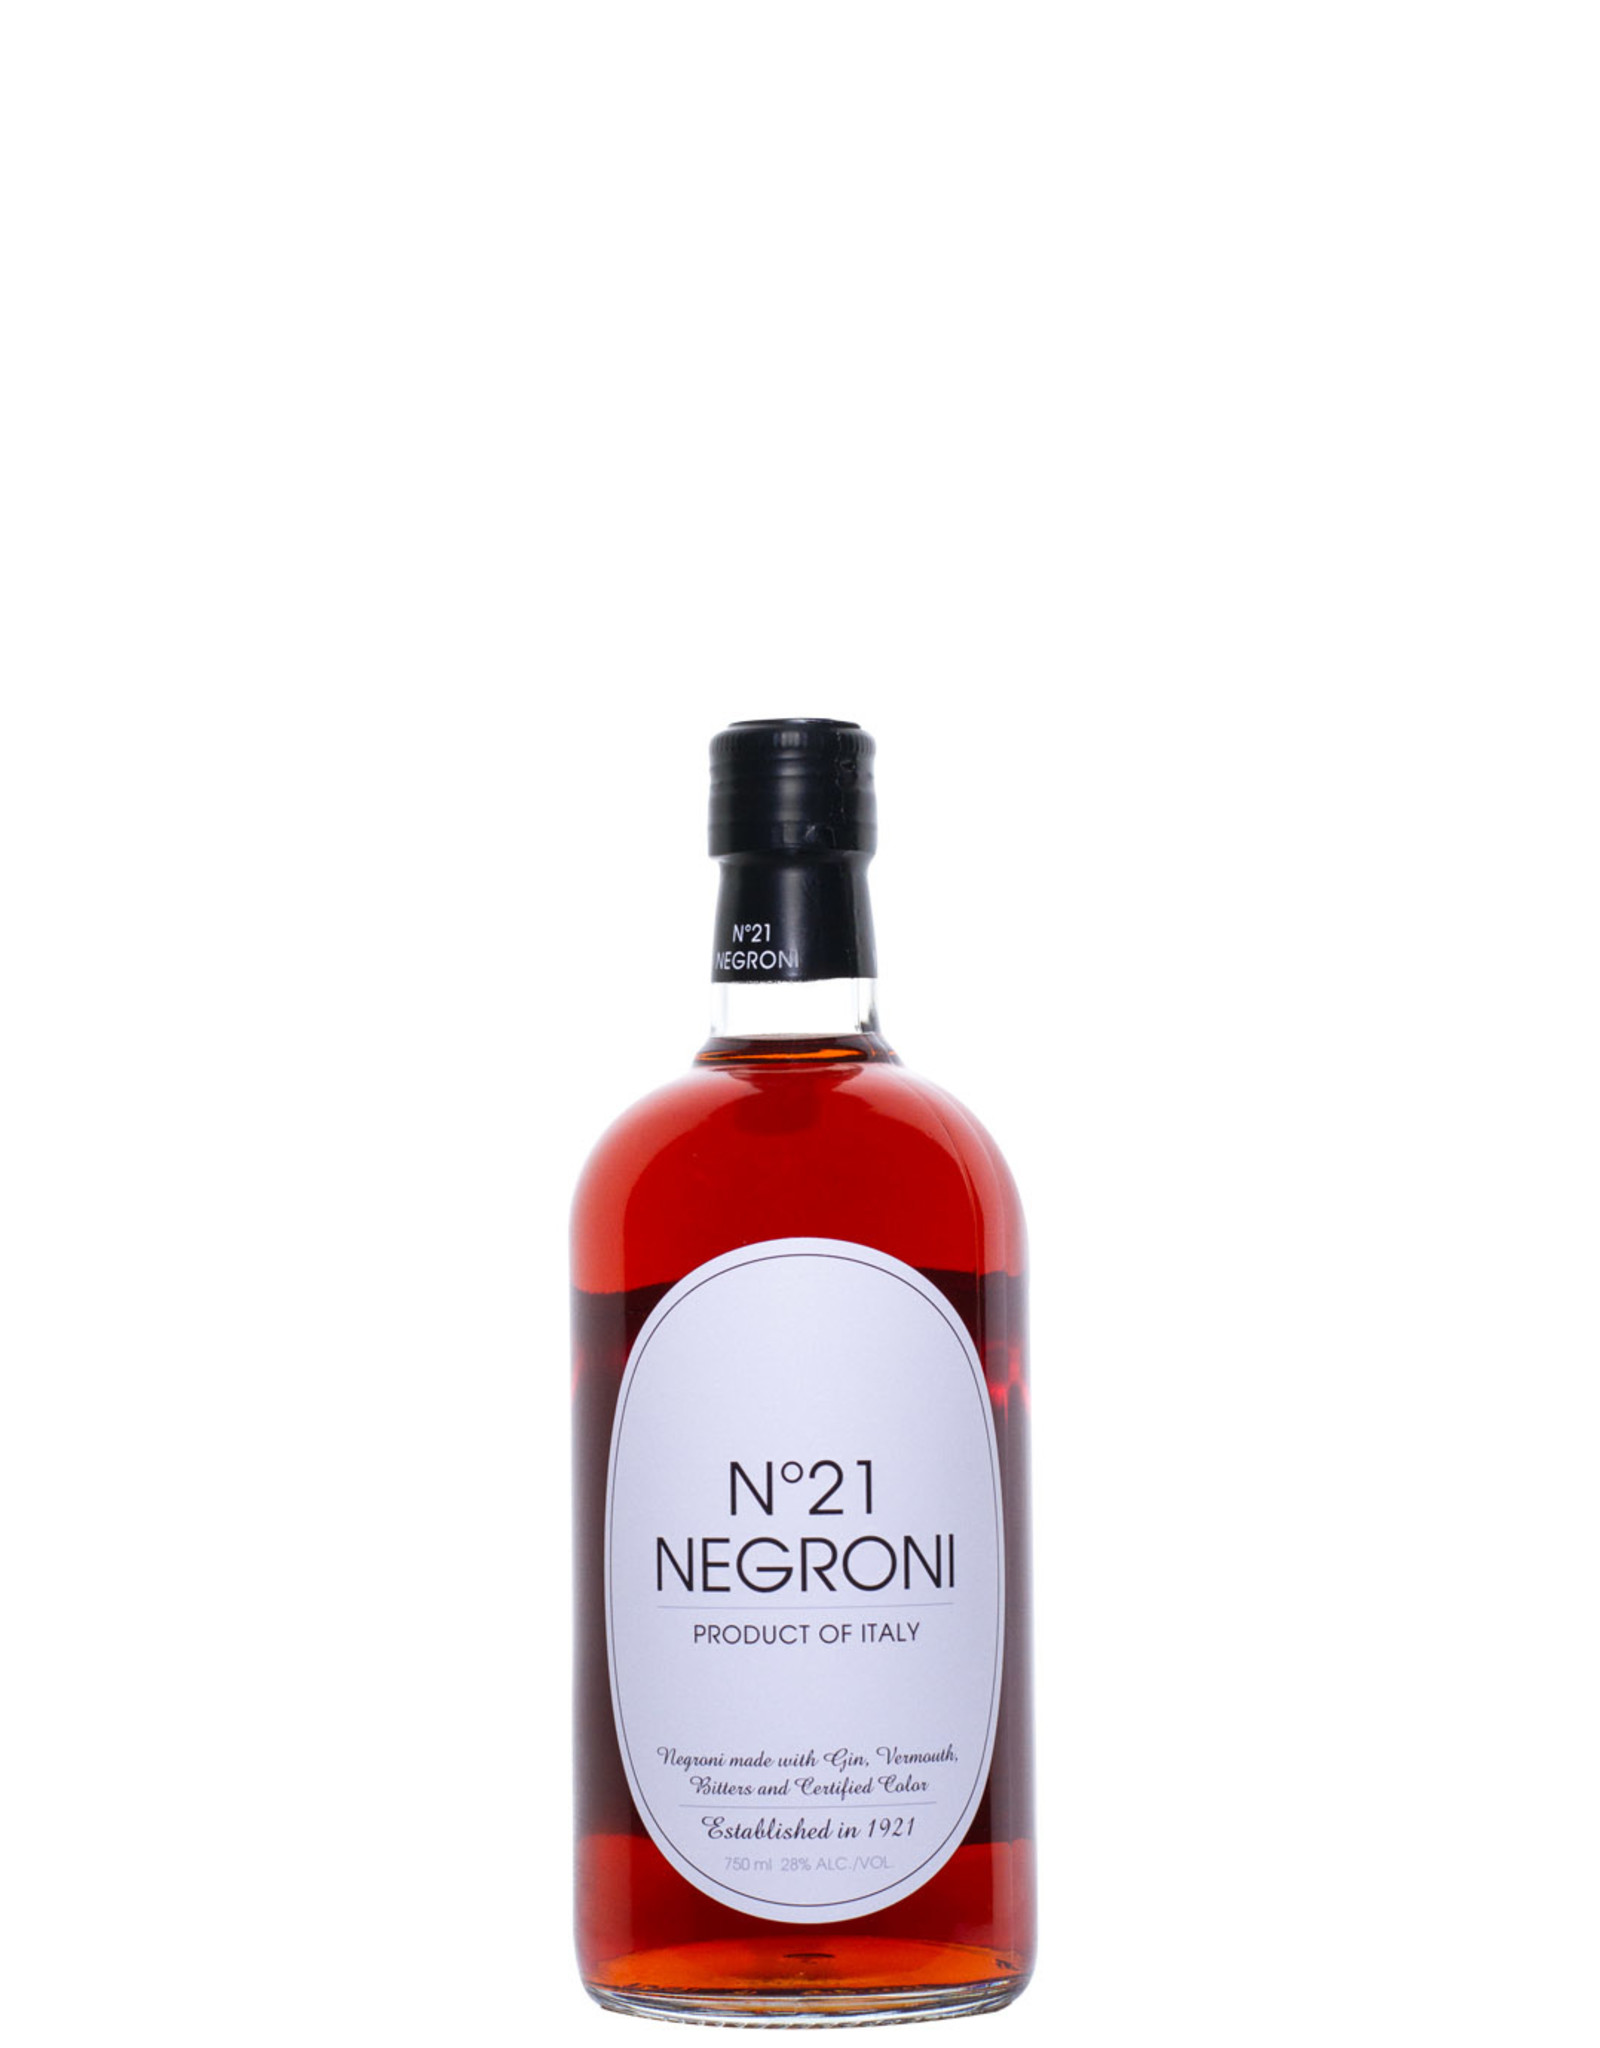 No.21 Negroni